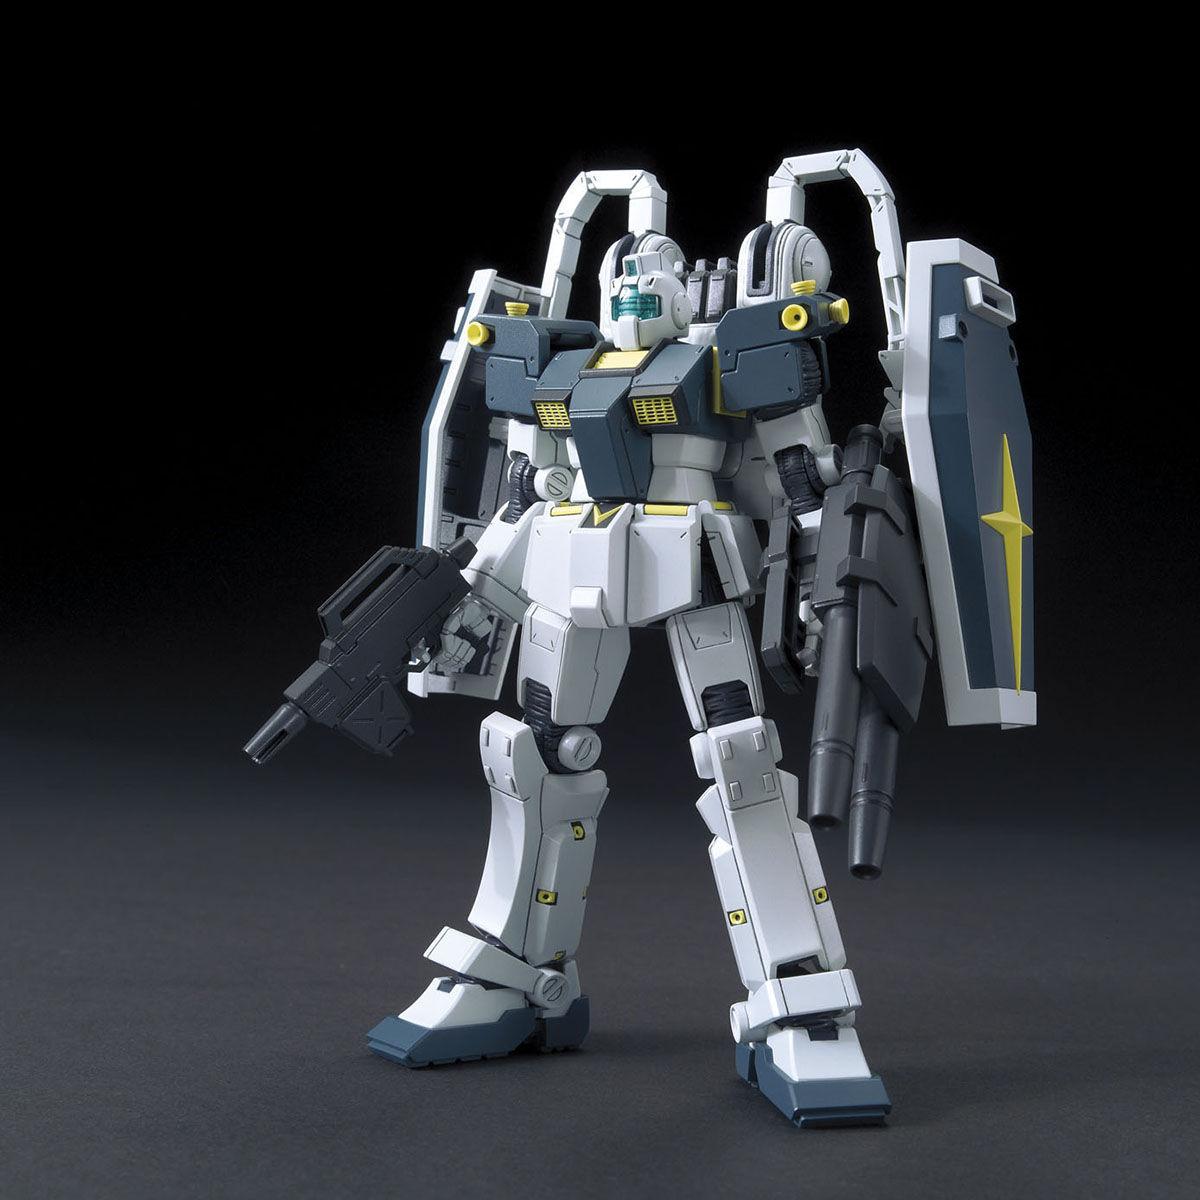 19441HGTB 1/144 RGM-79 ジム(GUNDAM THUNDERBOLT Ver.) [GM (Gundam Thunderbolt ONA Ver.)]